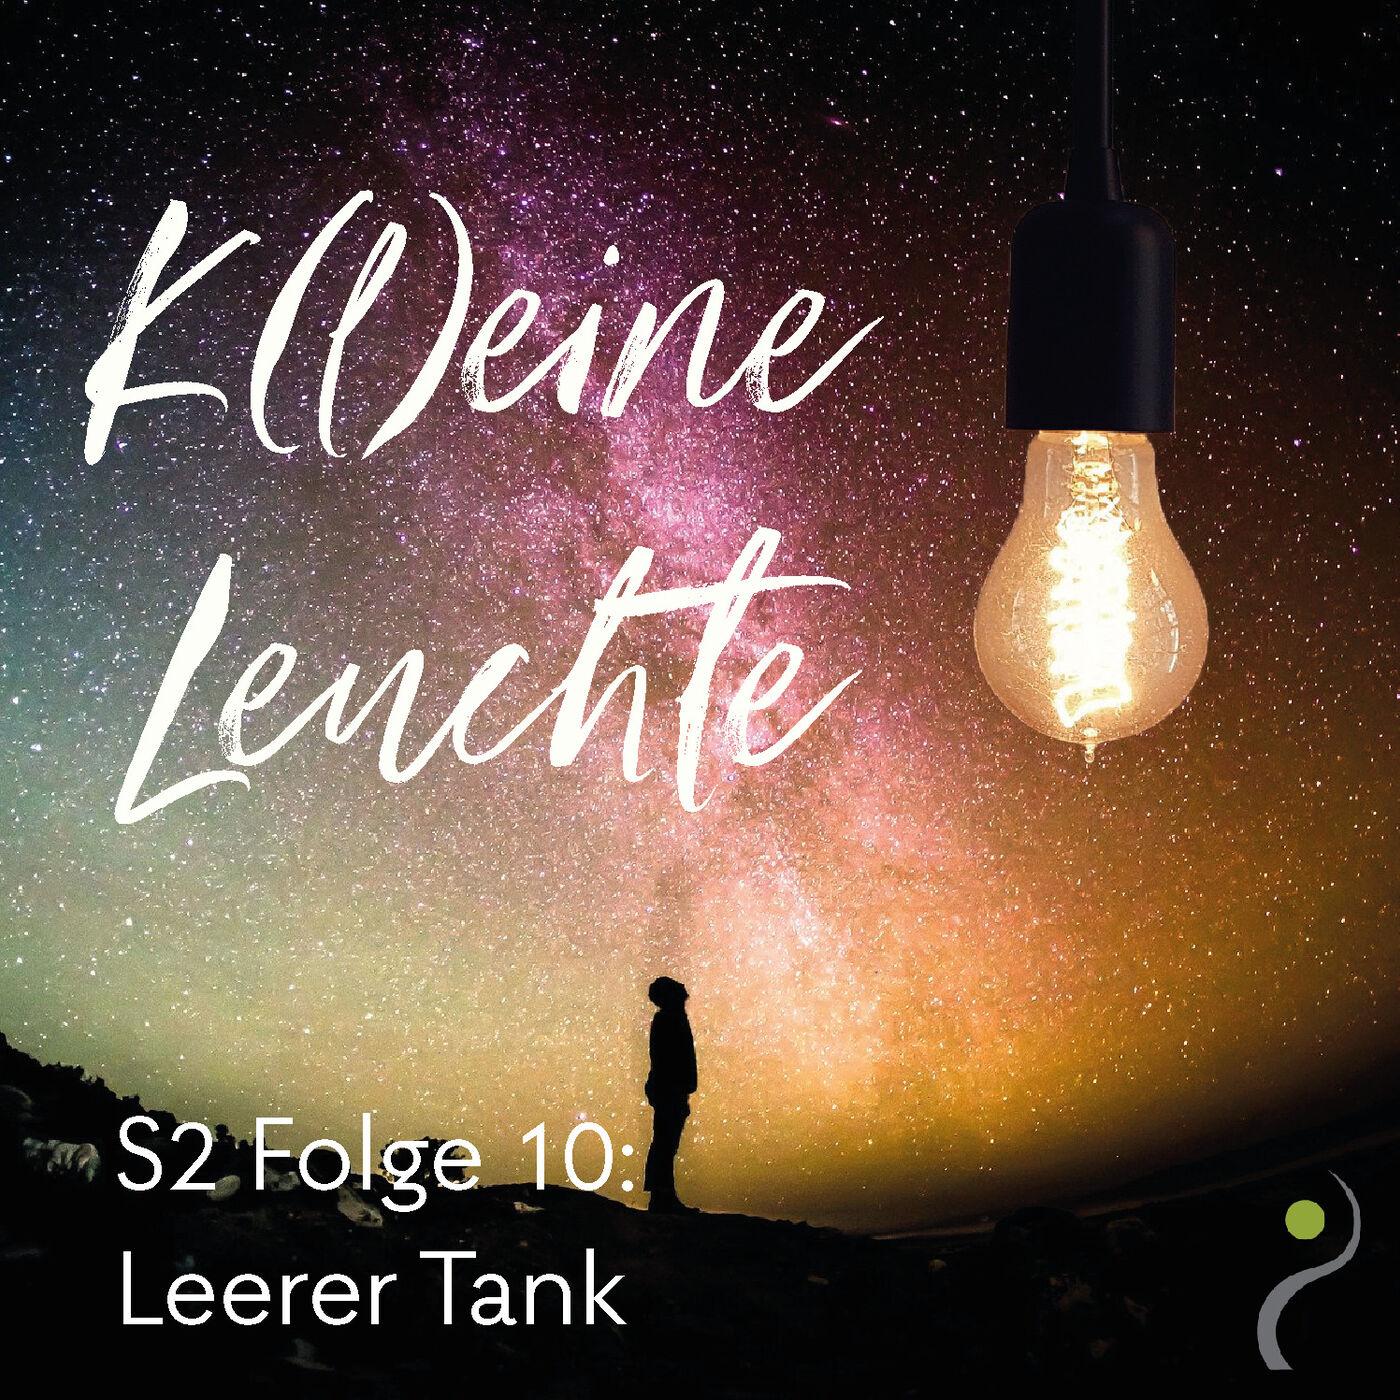 Leerer Tank